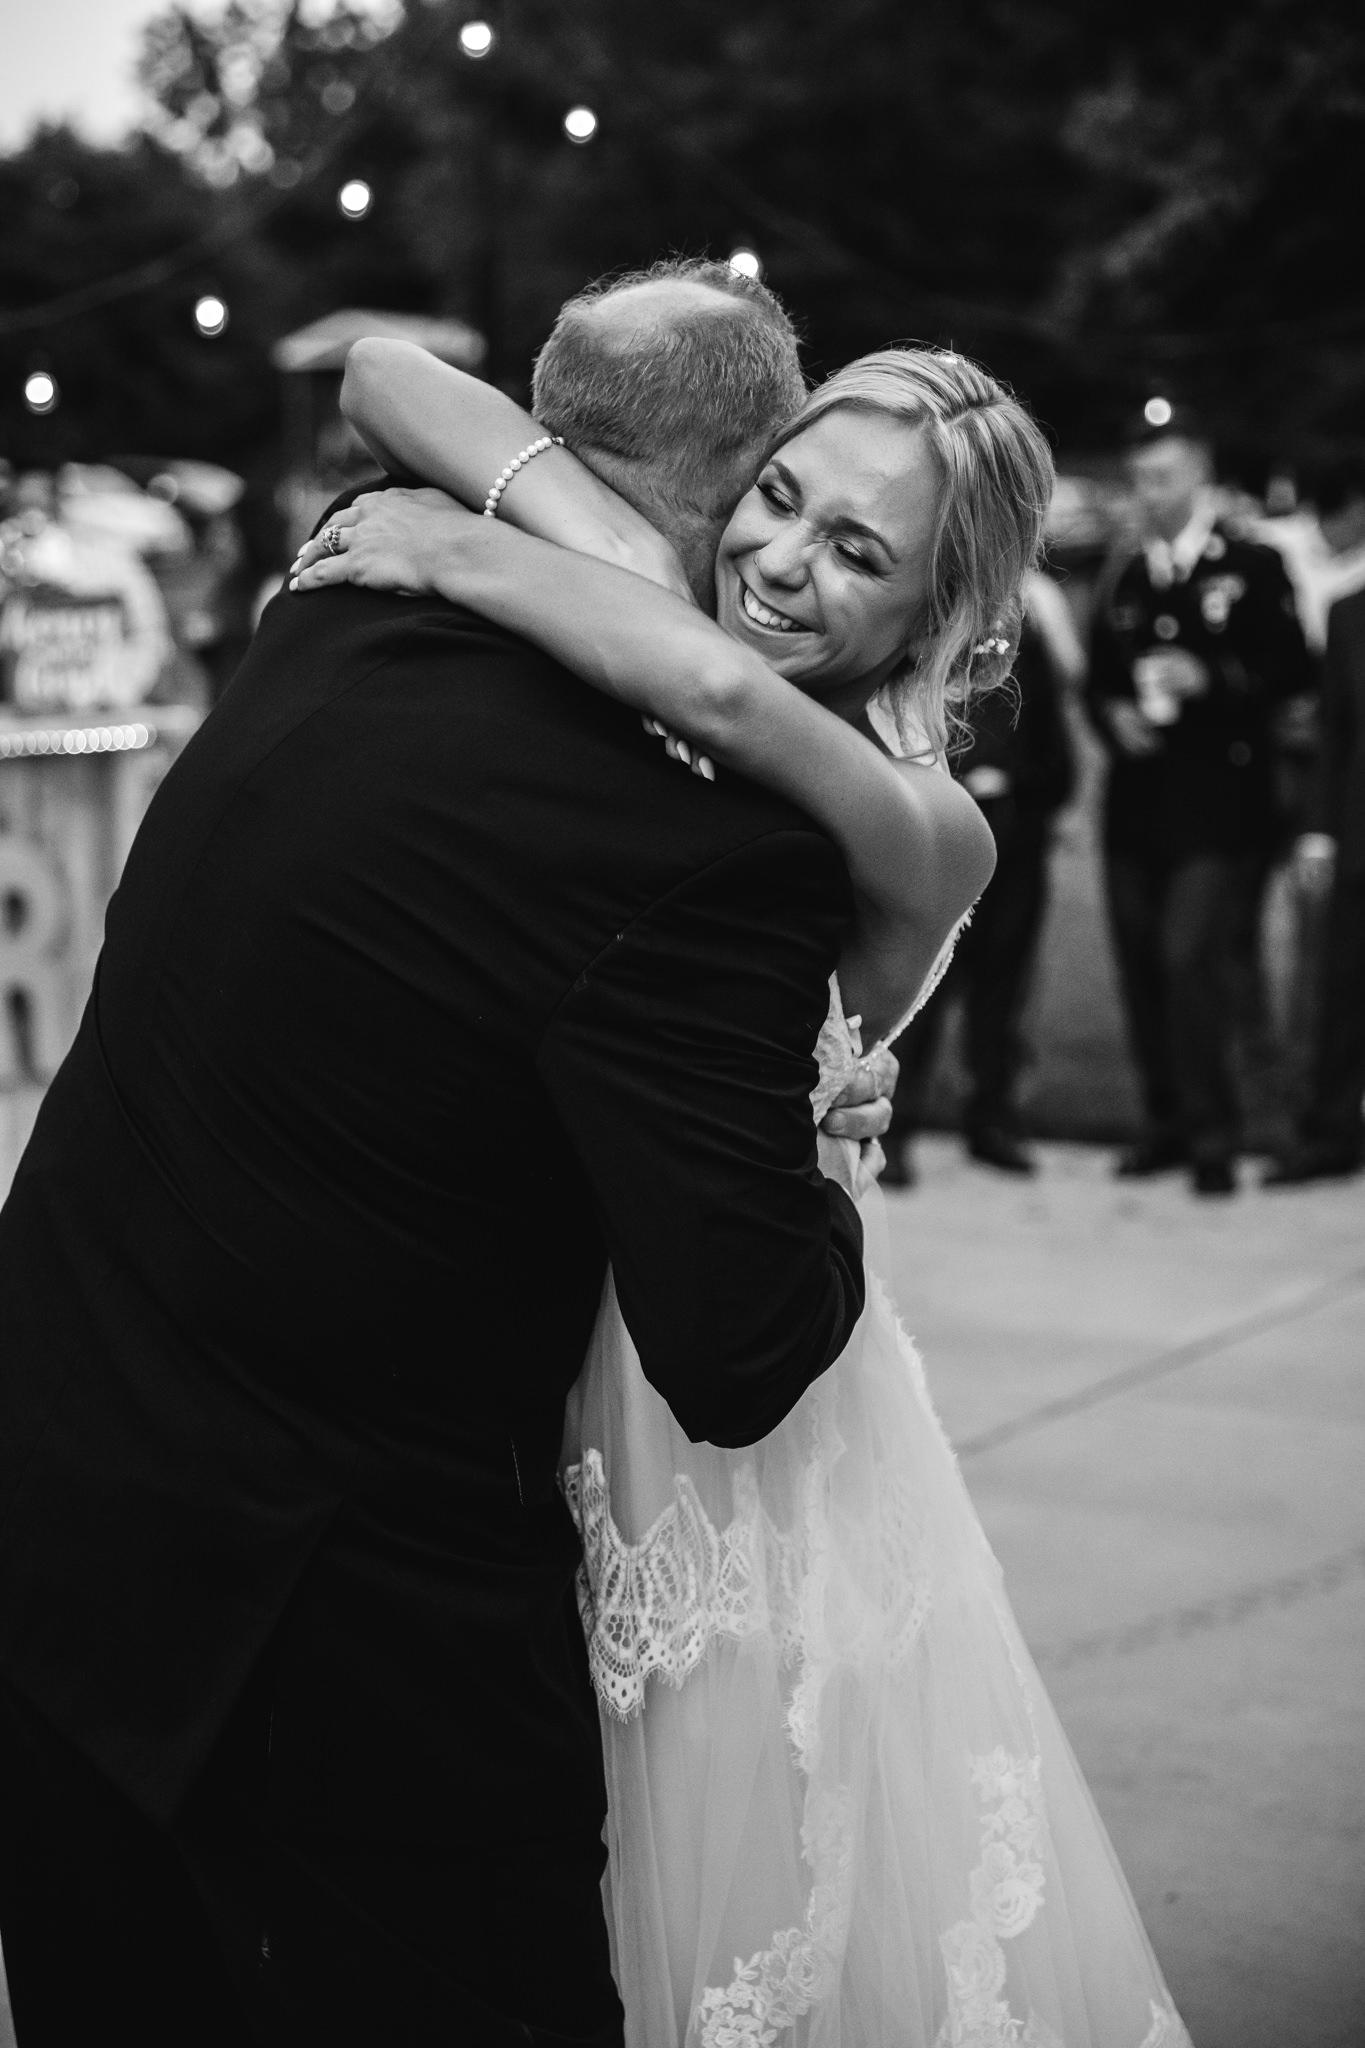 backyard-wedding-thewarmtharoundyou-lexy-branson-33.jpg